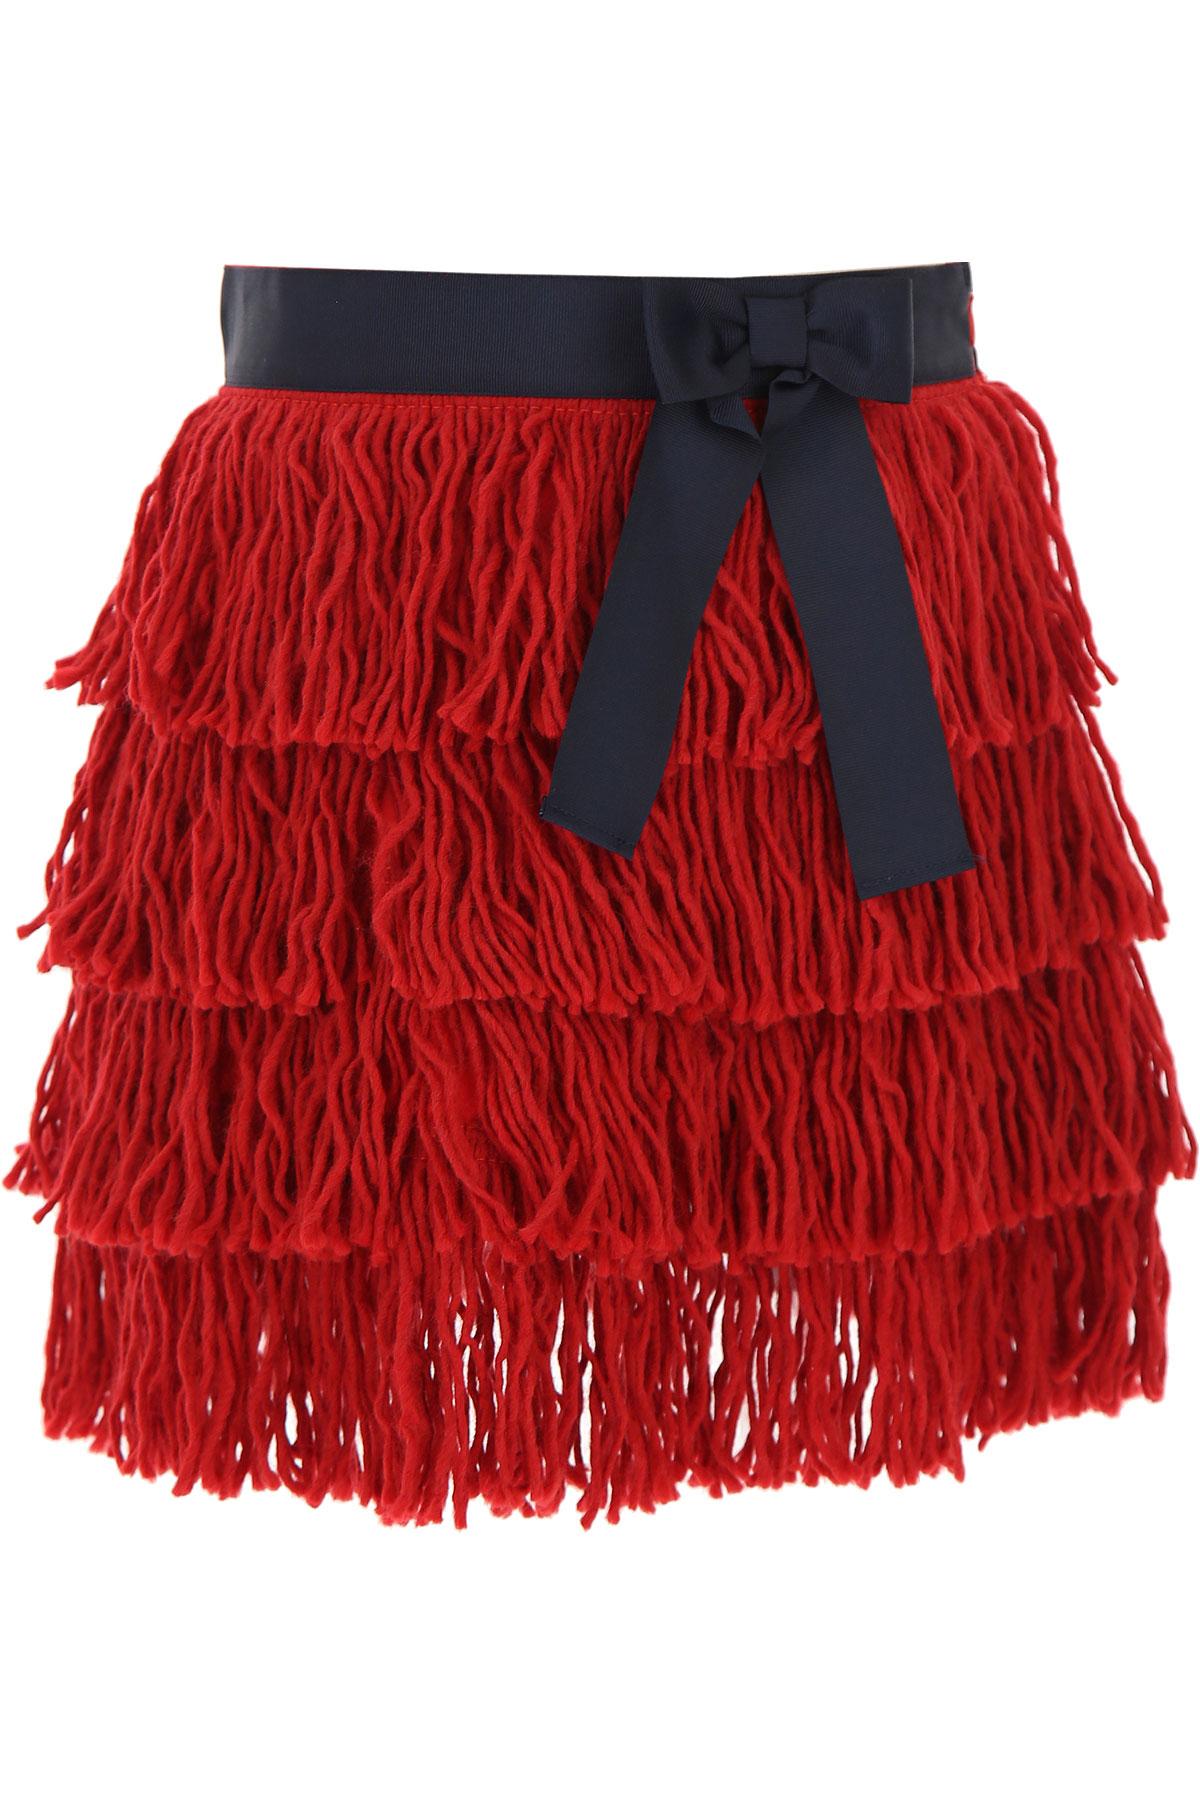 Stella Jean Kids Skirts for Girls On Sale, Red, Viscose, 2019, 10Y 4Y 6Y 8Y